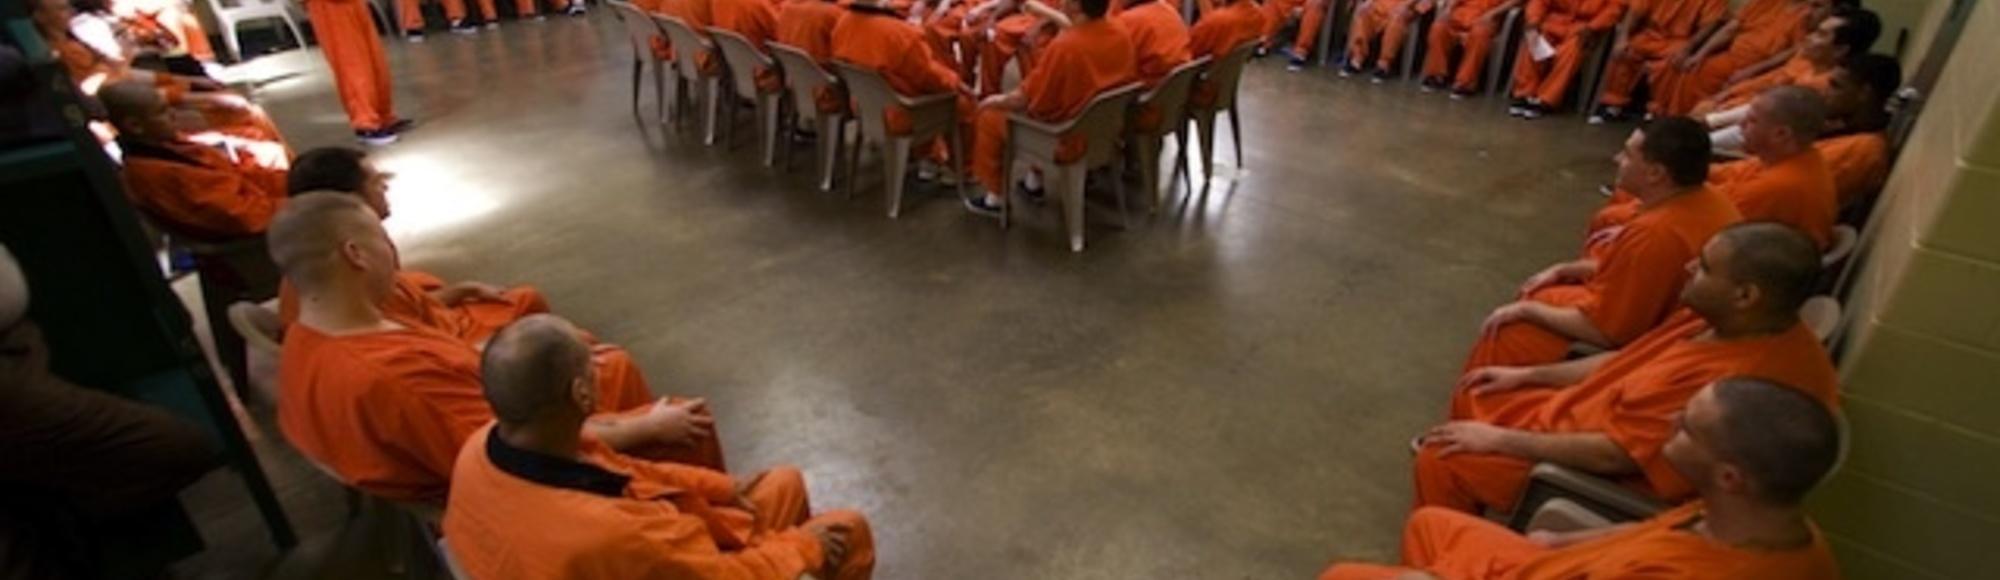 Rehab or Prison?